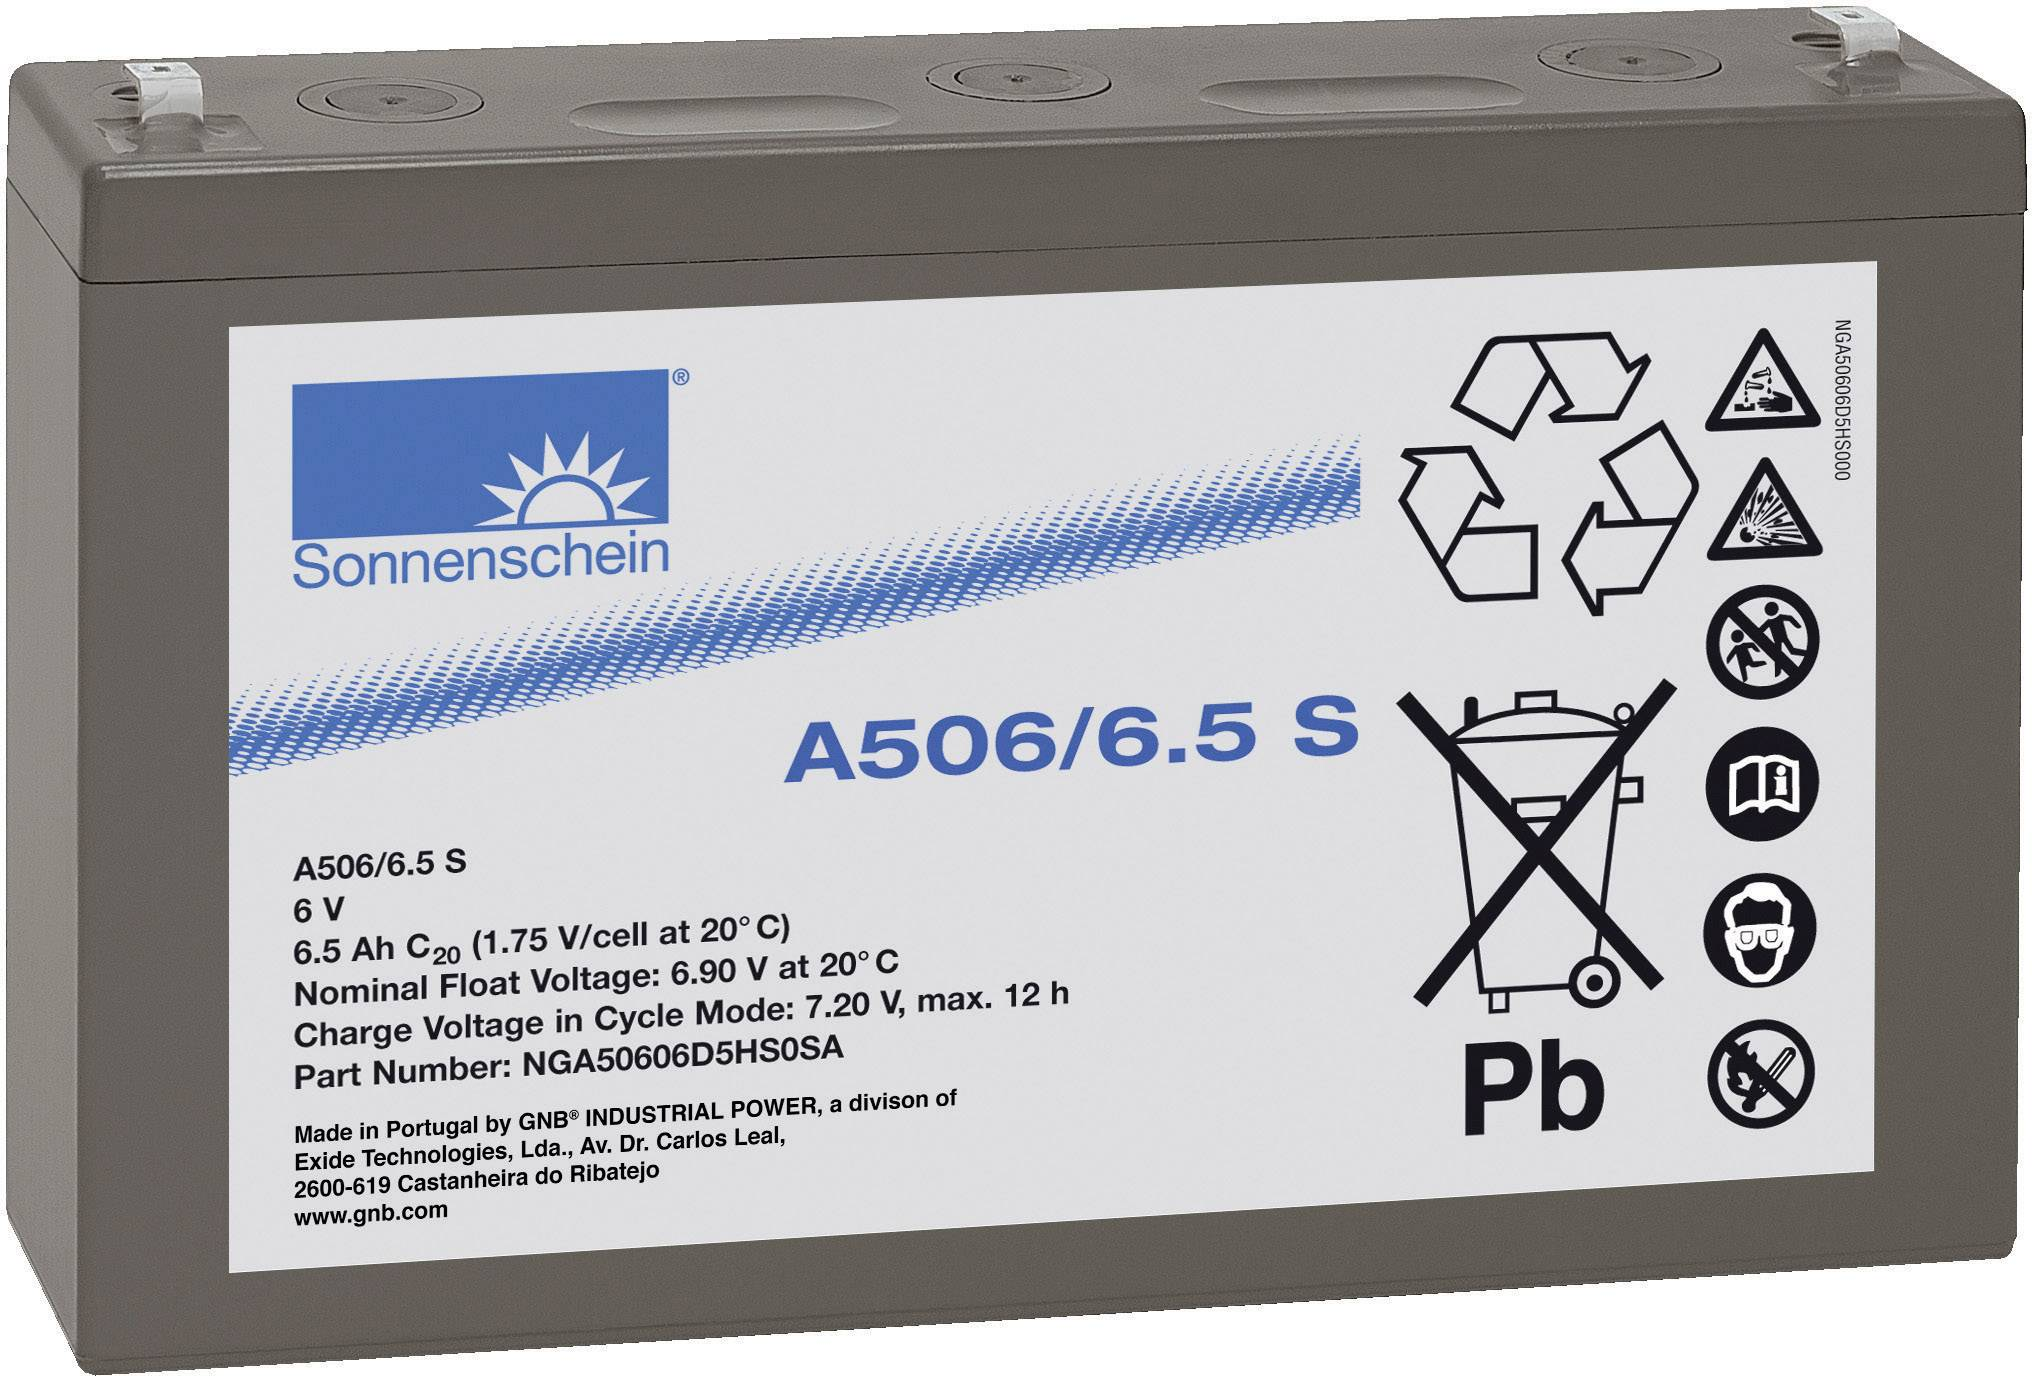 Olovený akumulátor GNB Sonnenschein A506/6,5 S NGA50606D5HS0SA, 6.5 Ah, 6 V